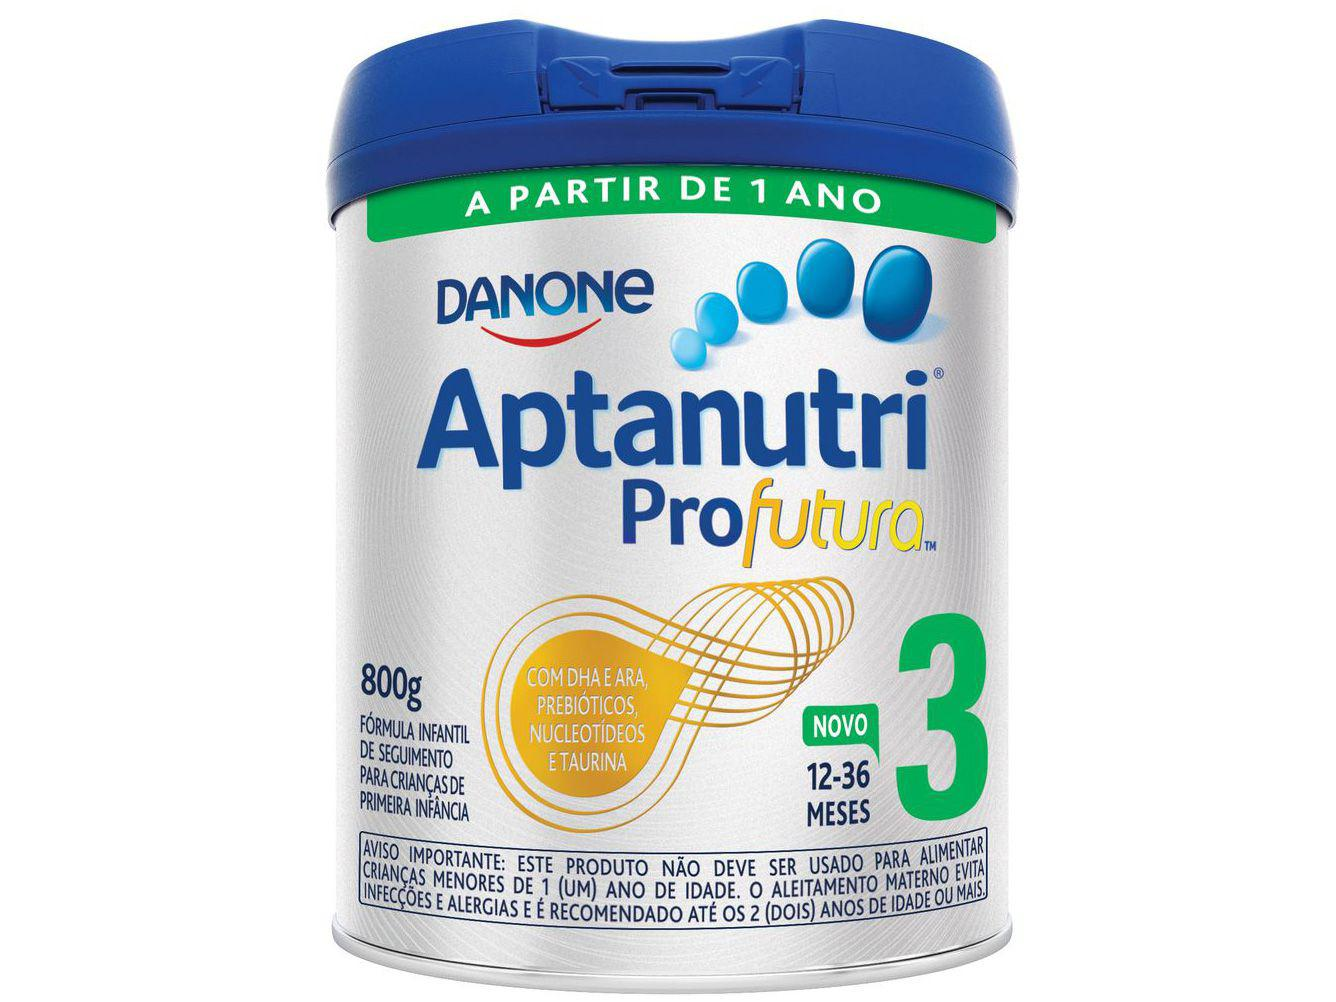 Fórmula Infantil Profutura 3 sem Sabor Aptanutri - 800g